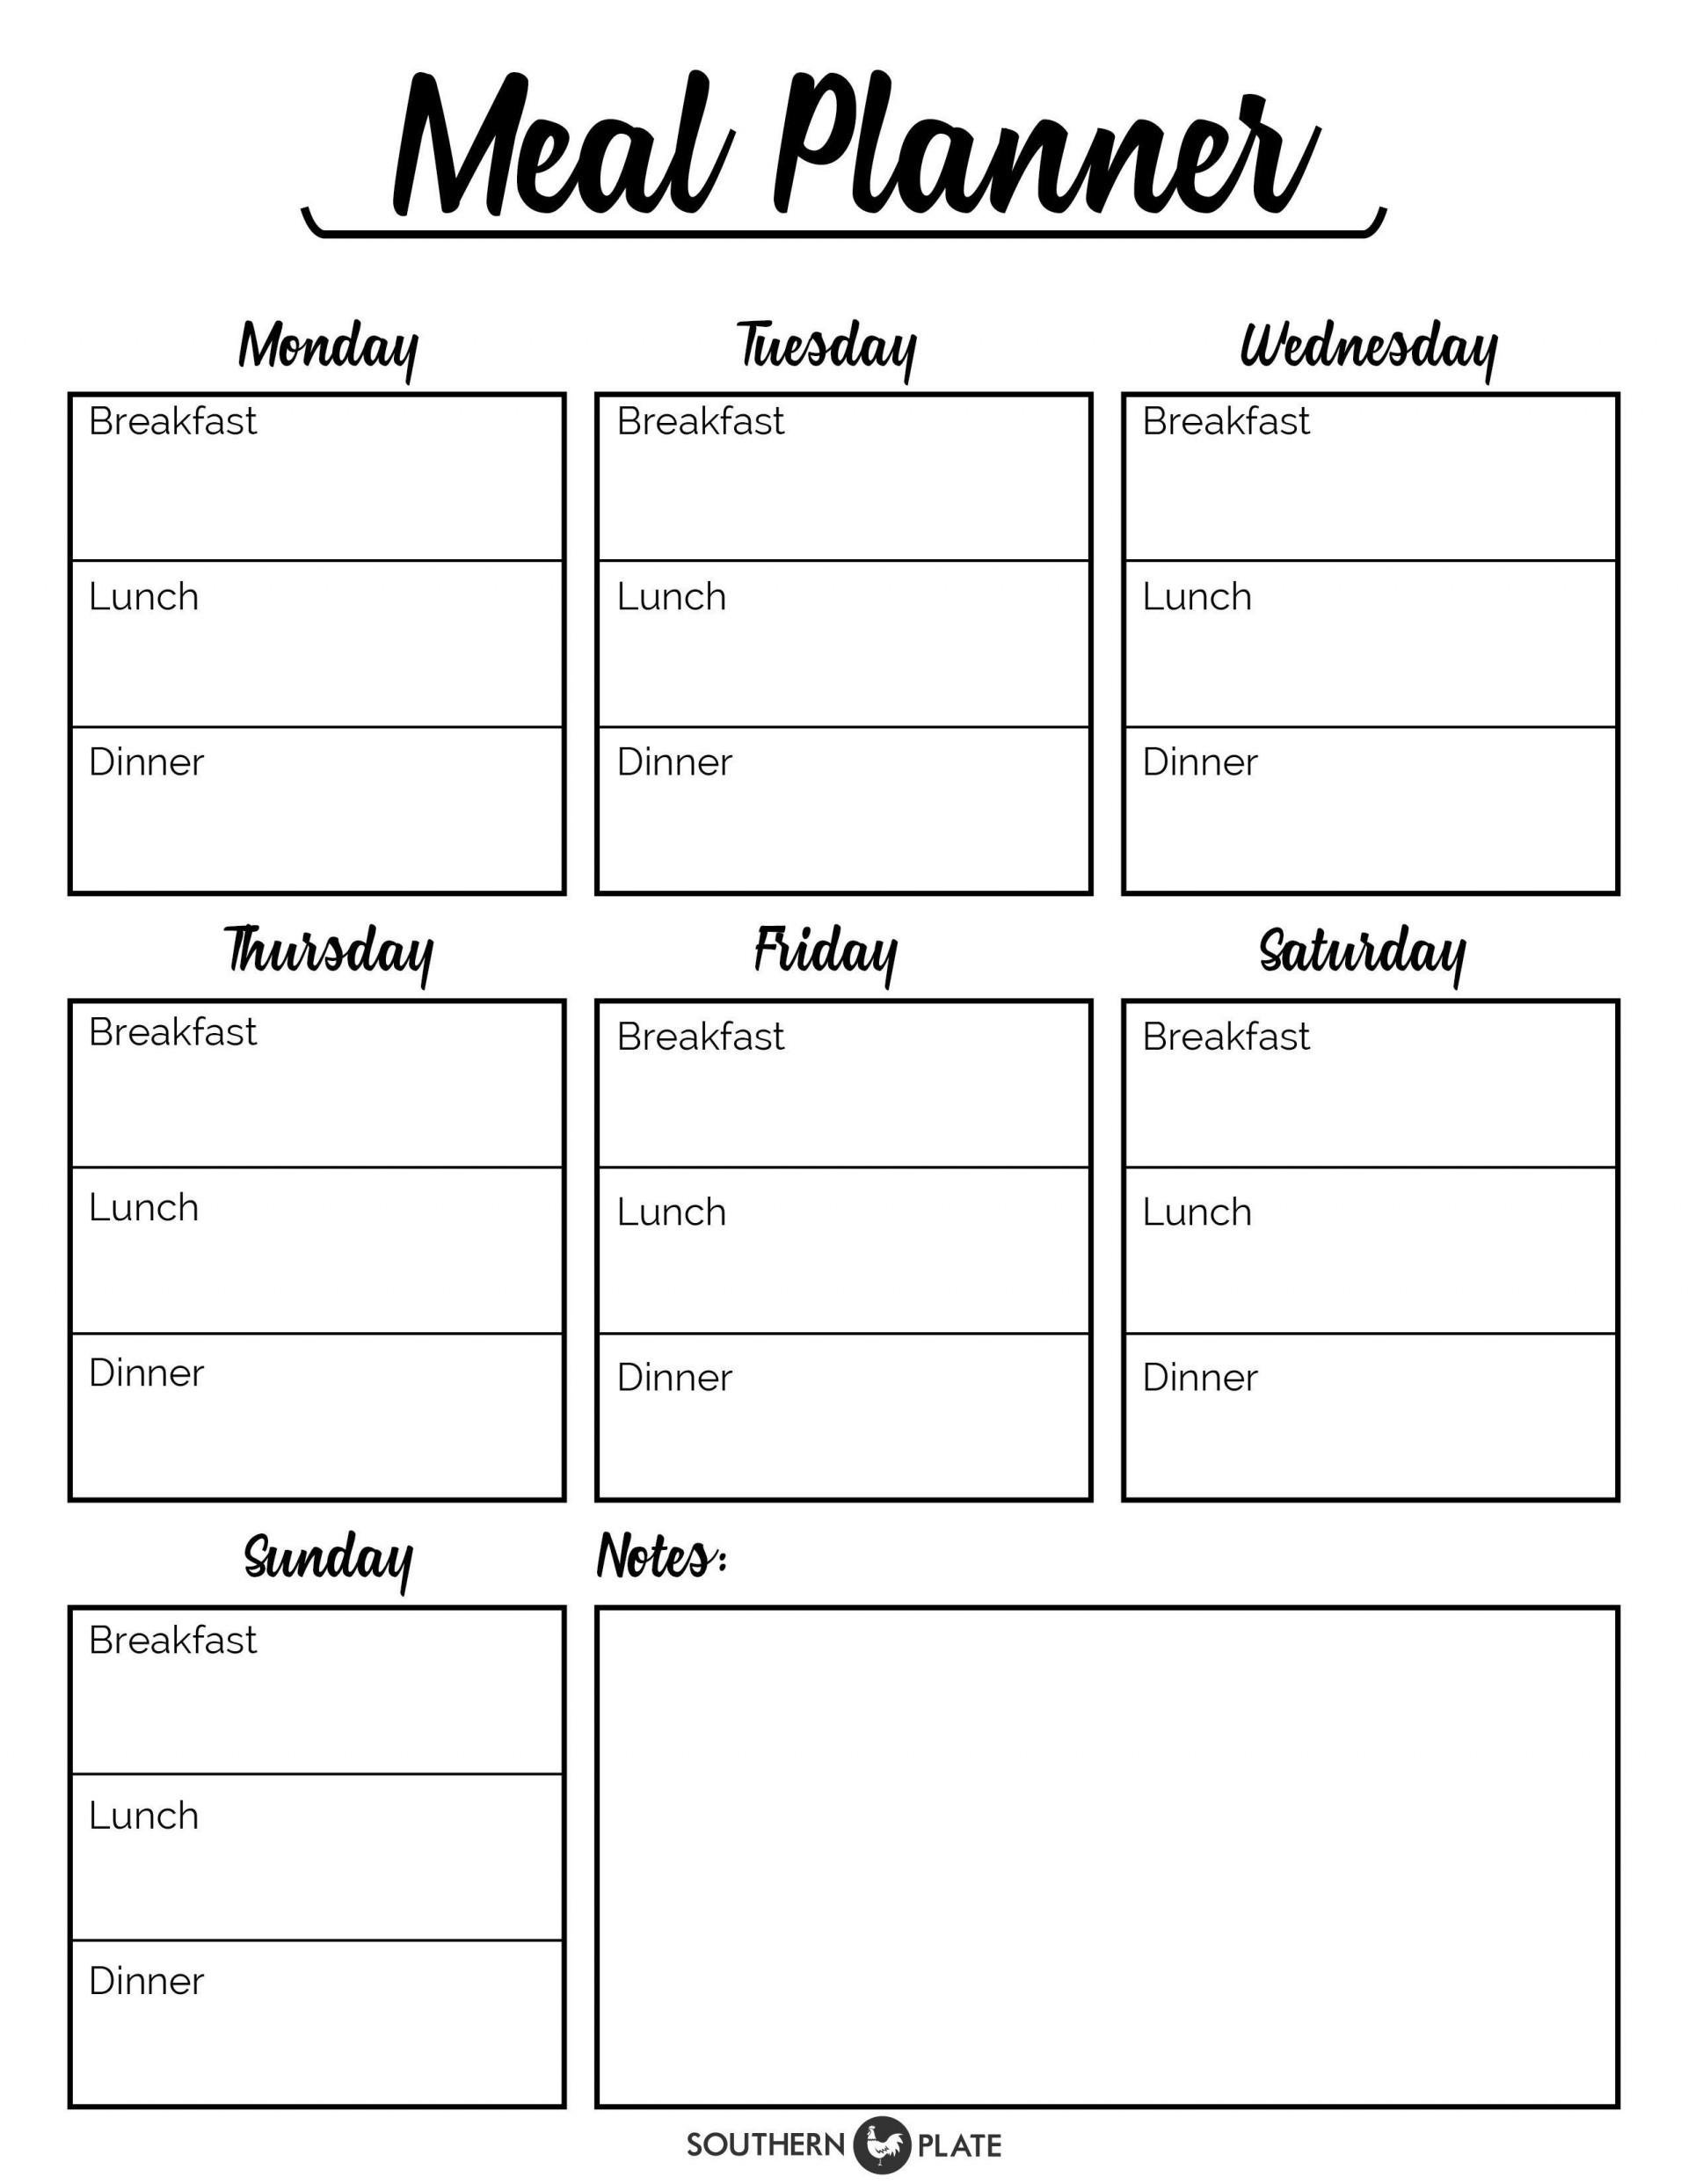 001 Incredible Meal Plan Printable Pdf Concept  Worksheet Downloadable Template Sheet1920